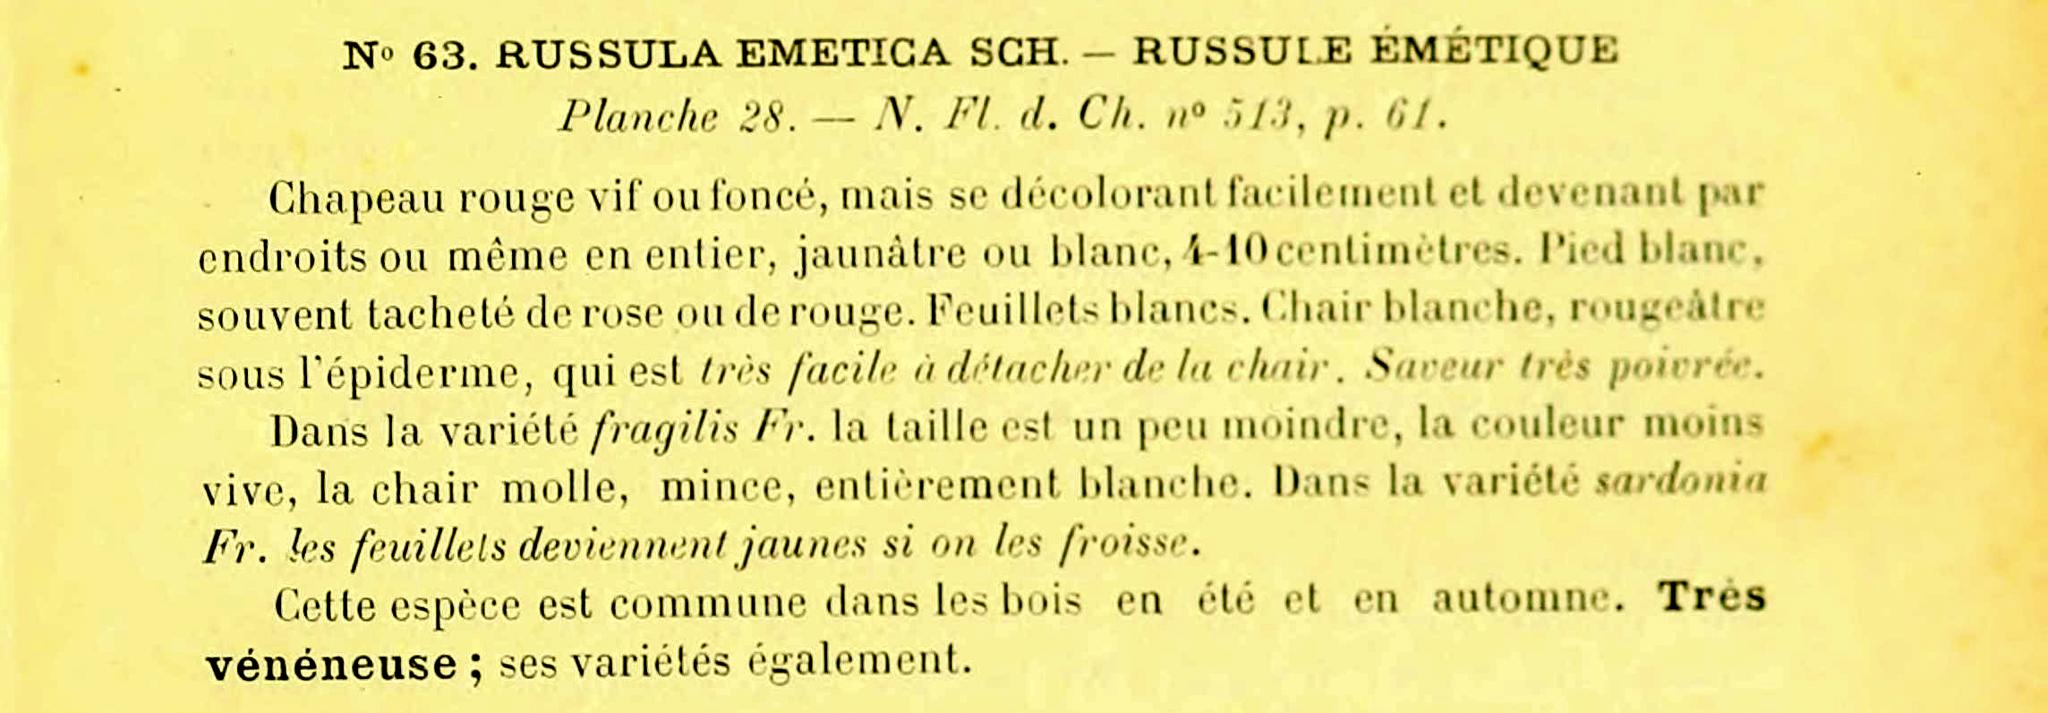 Russula emetica - The Hall of Einar